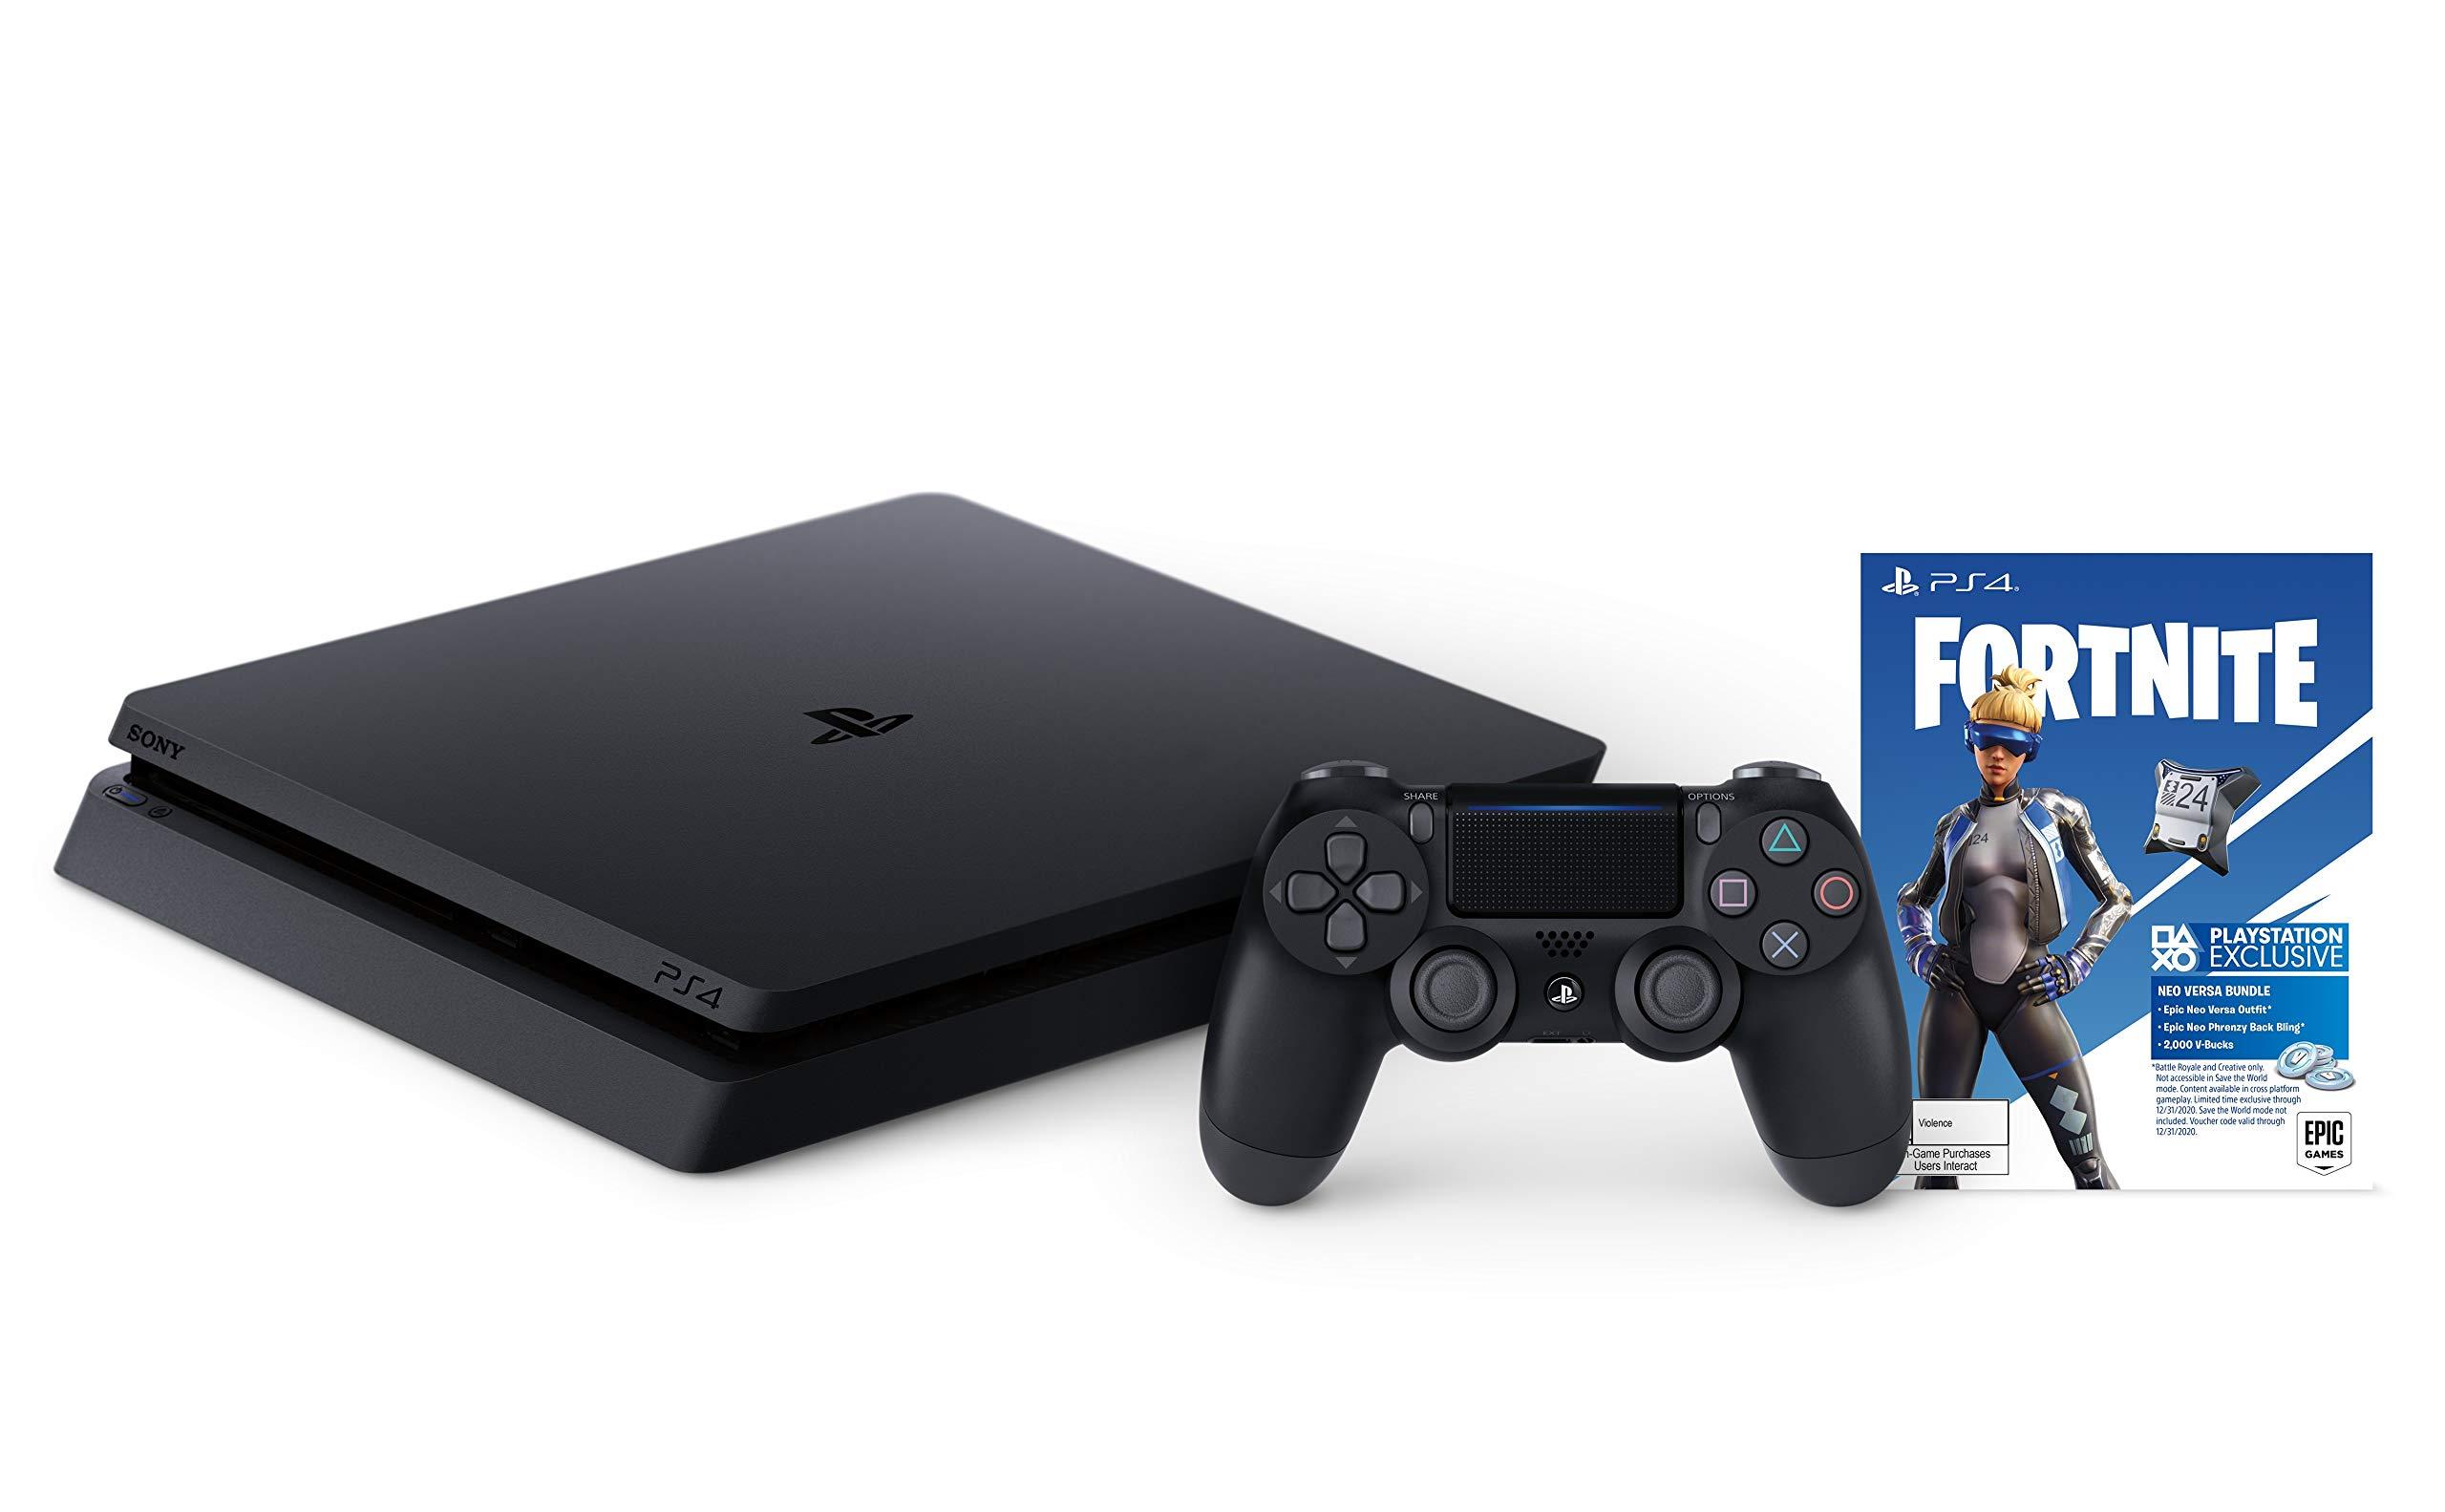 Consola PlayStation 4 Slim 1TB - Paquete Fortnite